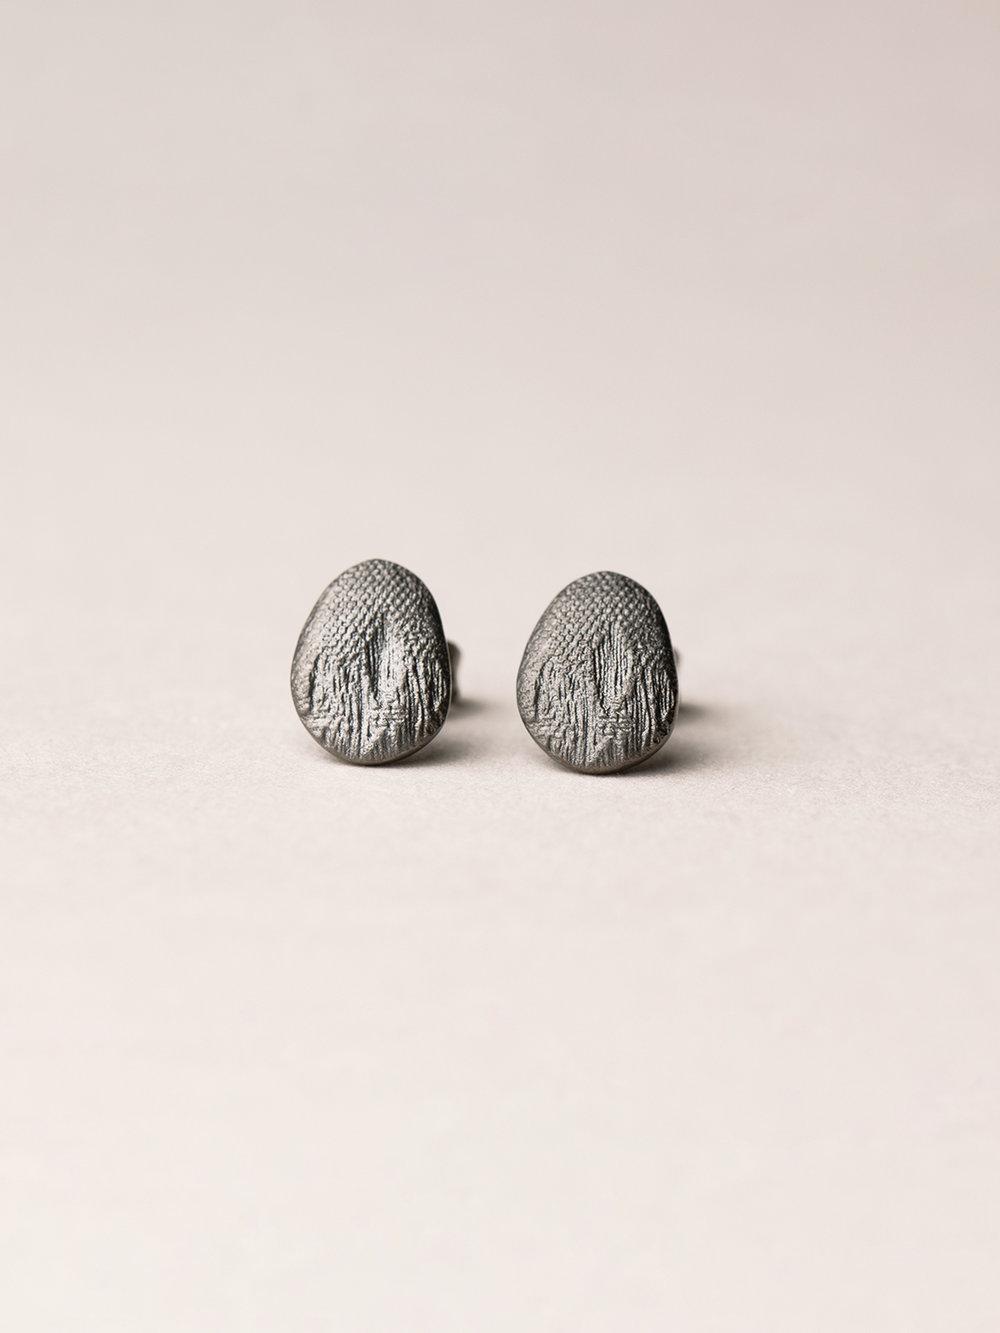 Ovale Amia-Ohrstecker in scharzrutheniertem Silber  Amia, oval stud earrings in blackruthenized silver